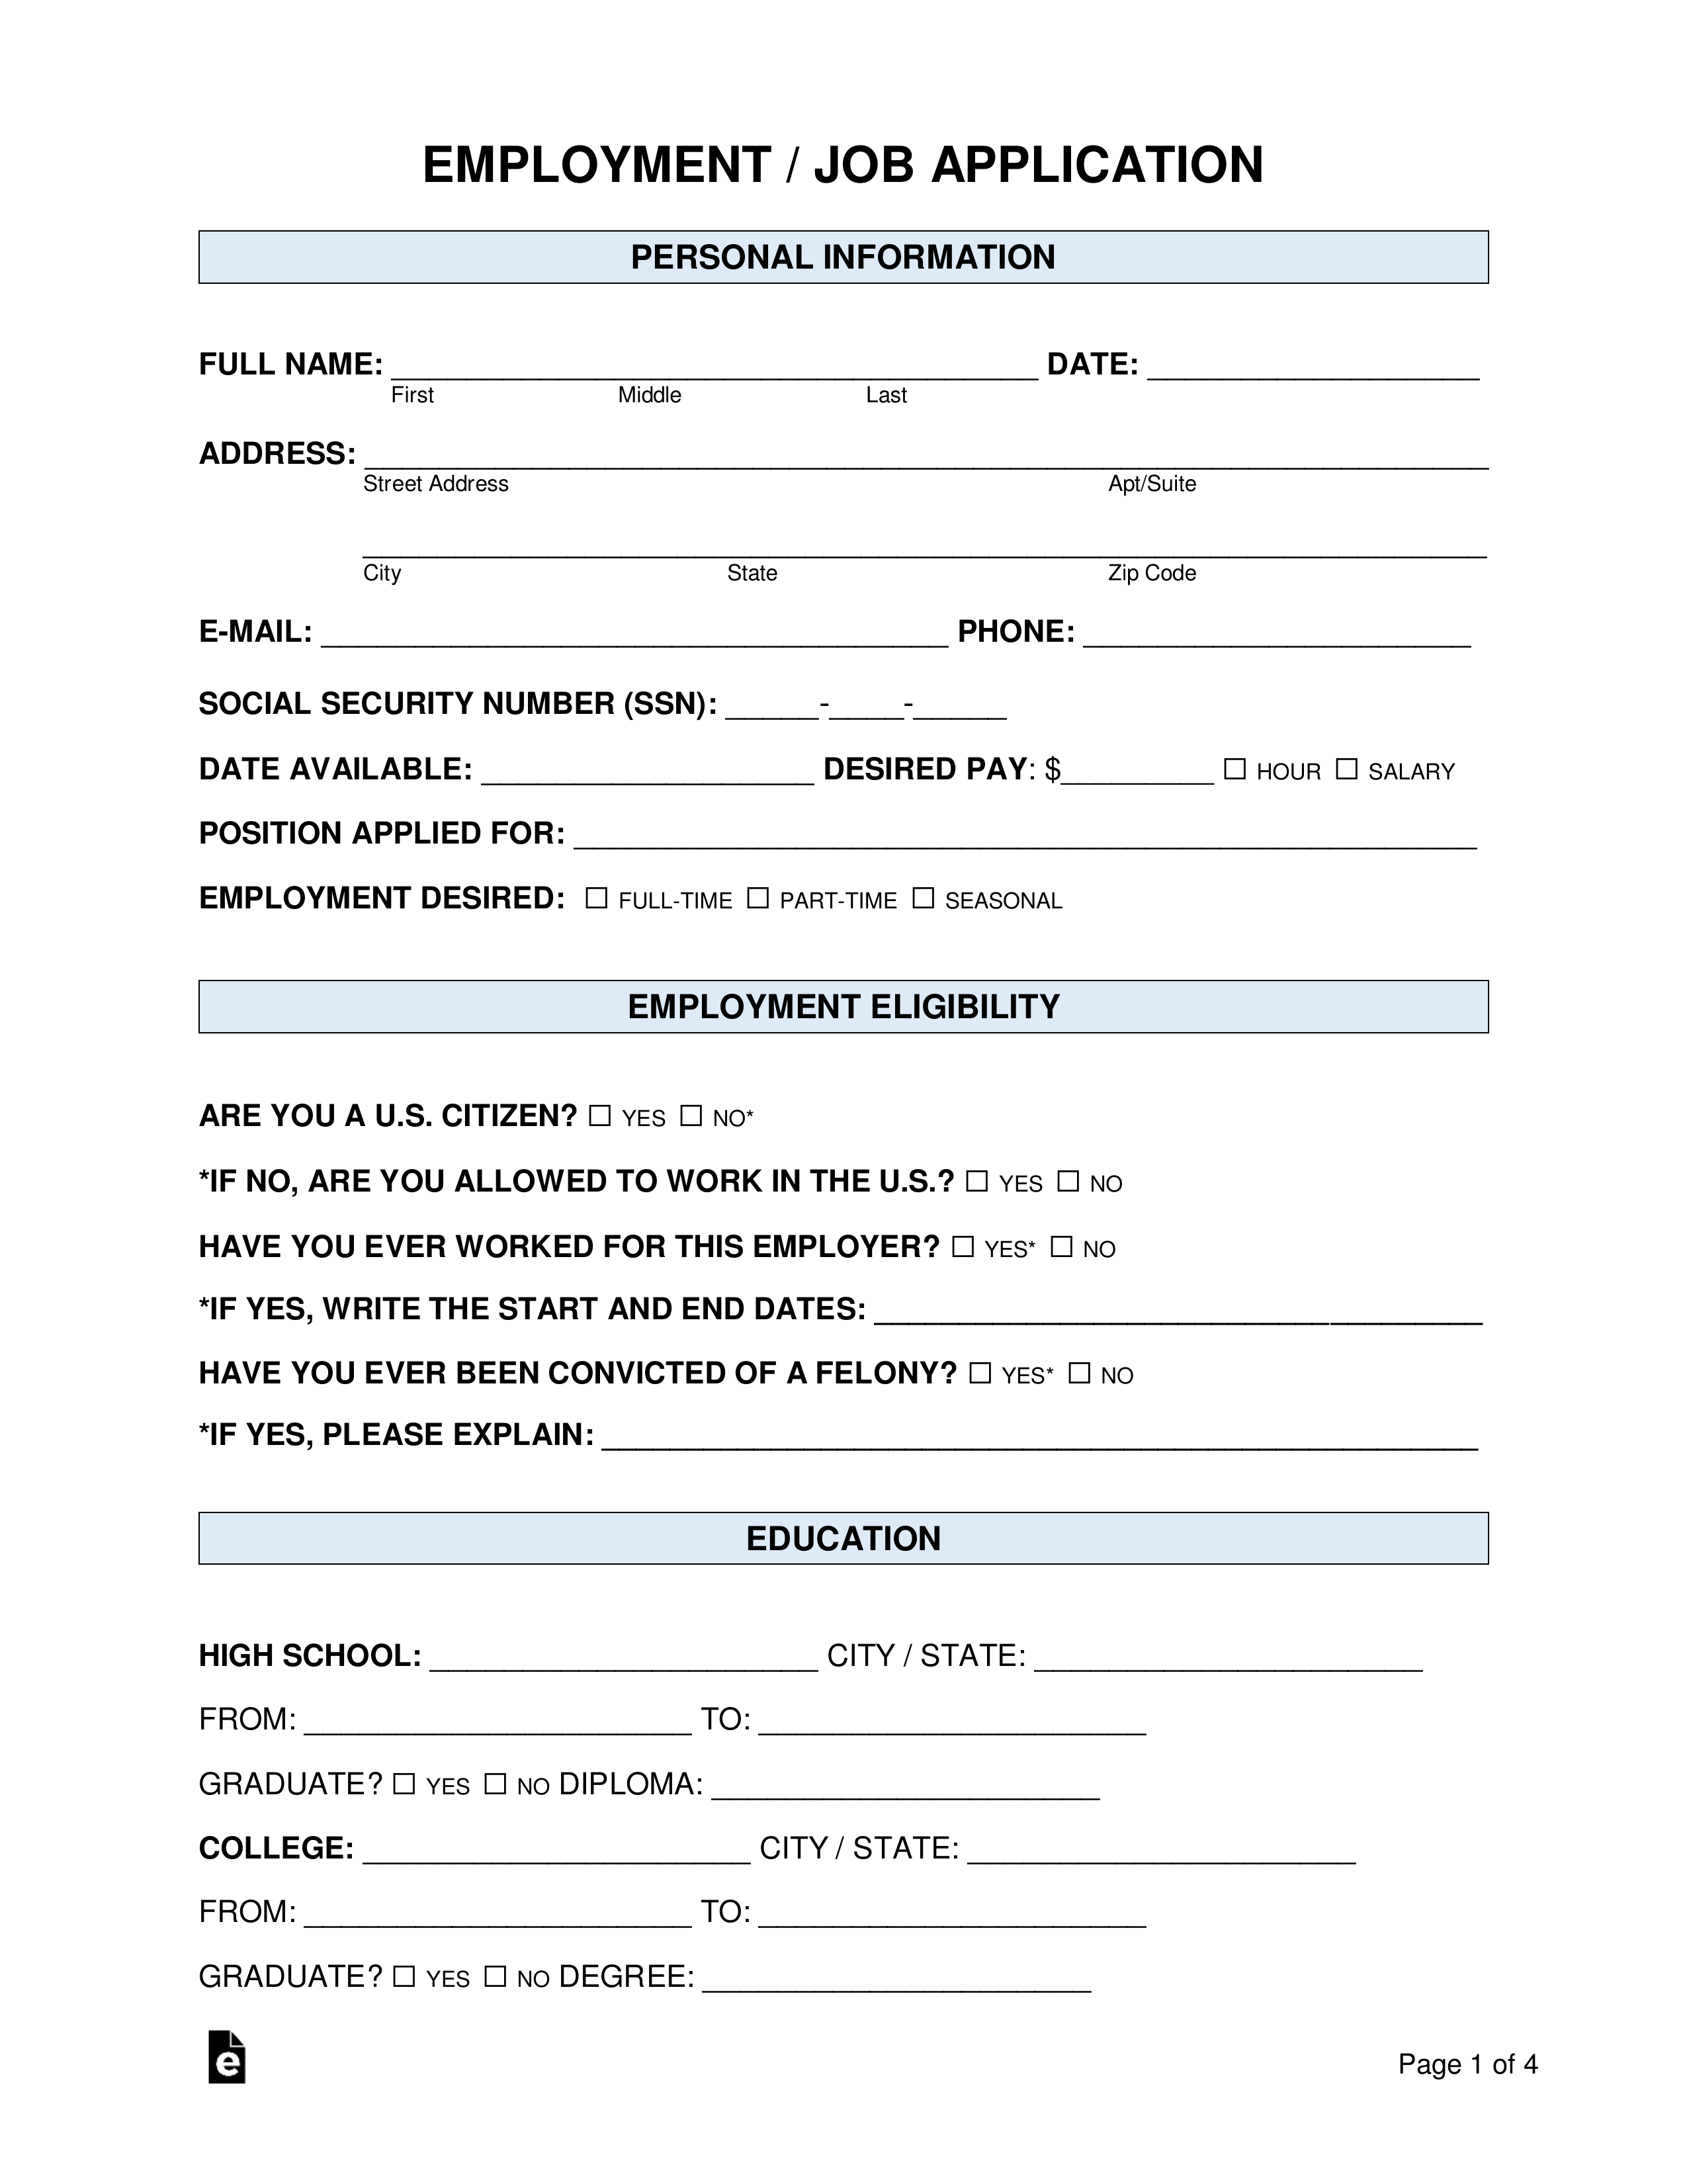 Free Job Application Form - Standard Template - Pdf   Word Inside Job Application Template Word Document